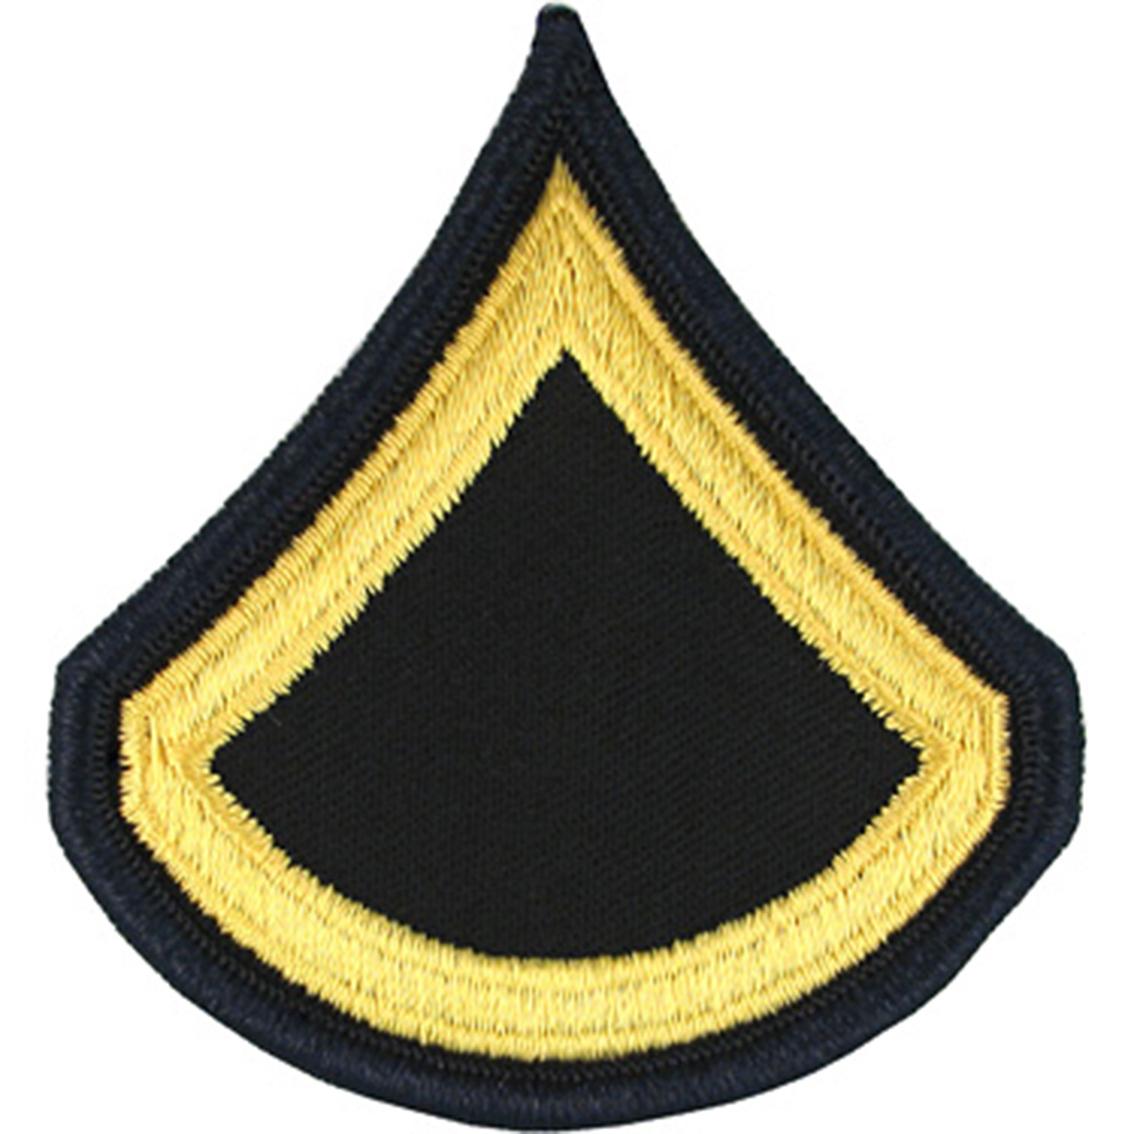 Army Rank Pfc Small Asu Sew-on | Small Asu Rank | Military | Shop The